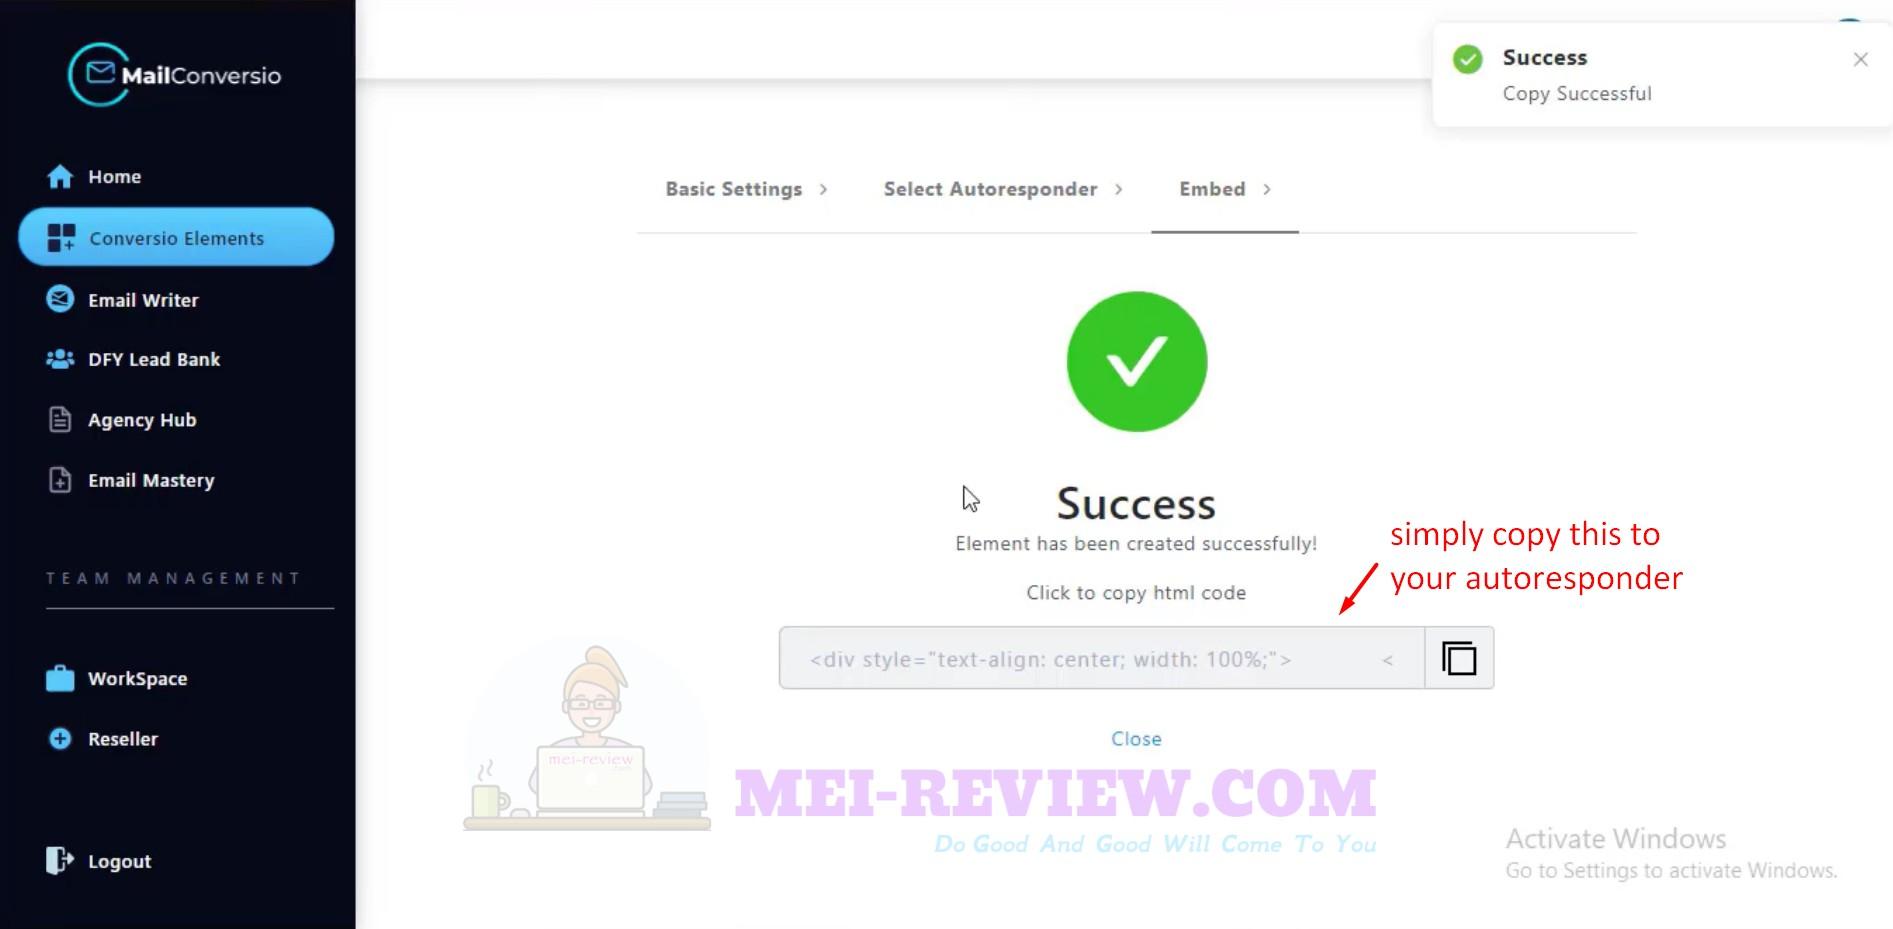 MailConversio-Step-8